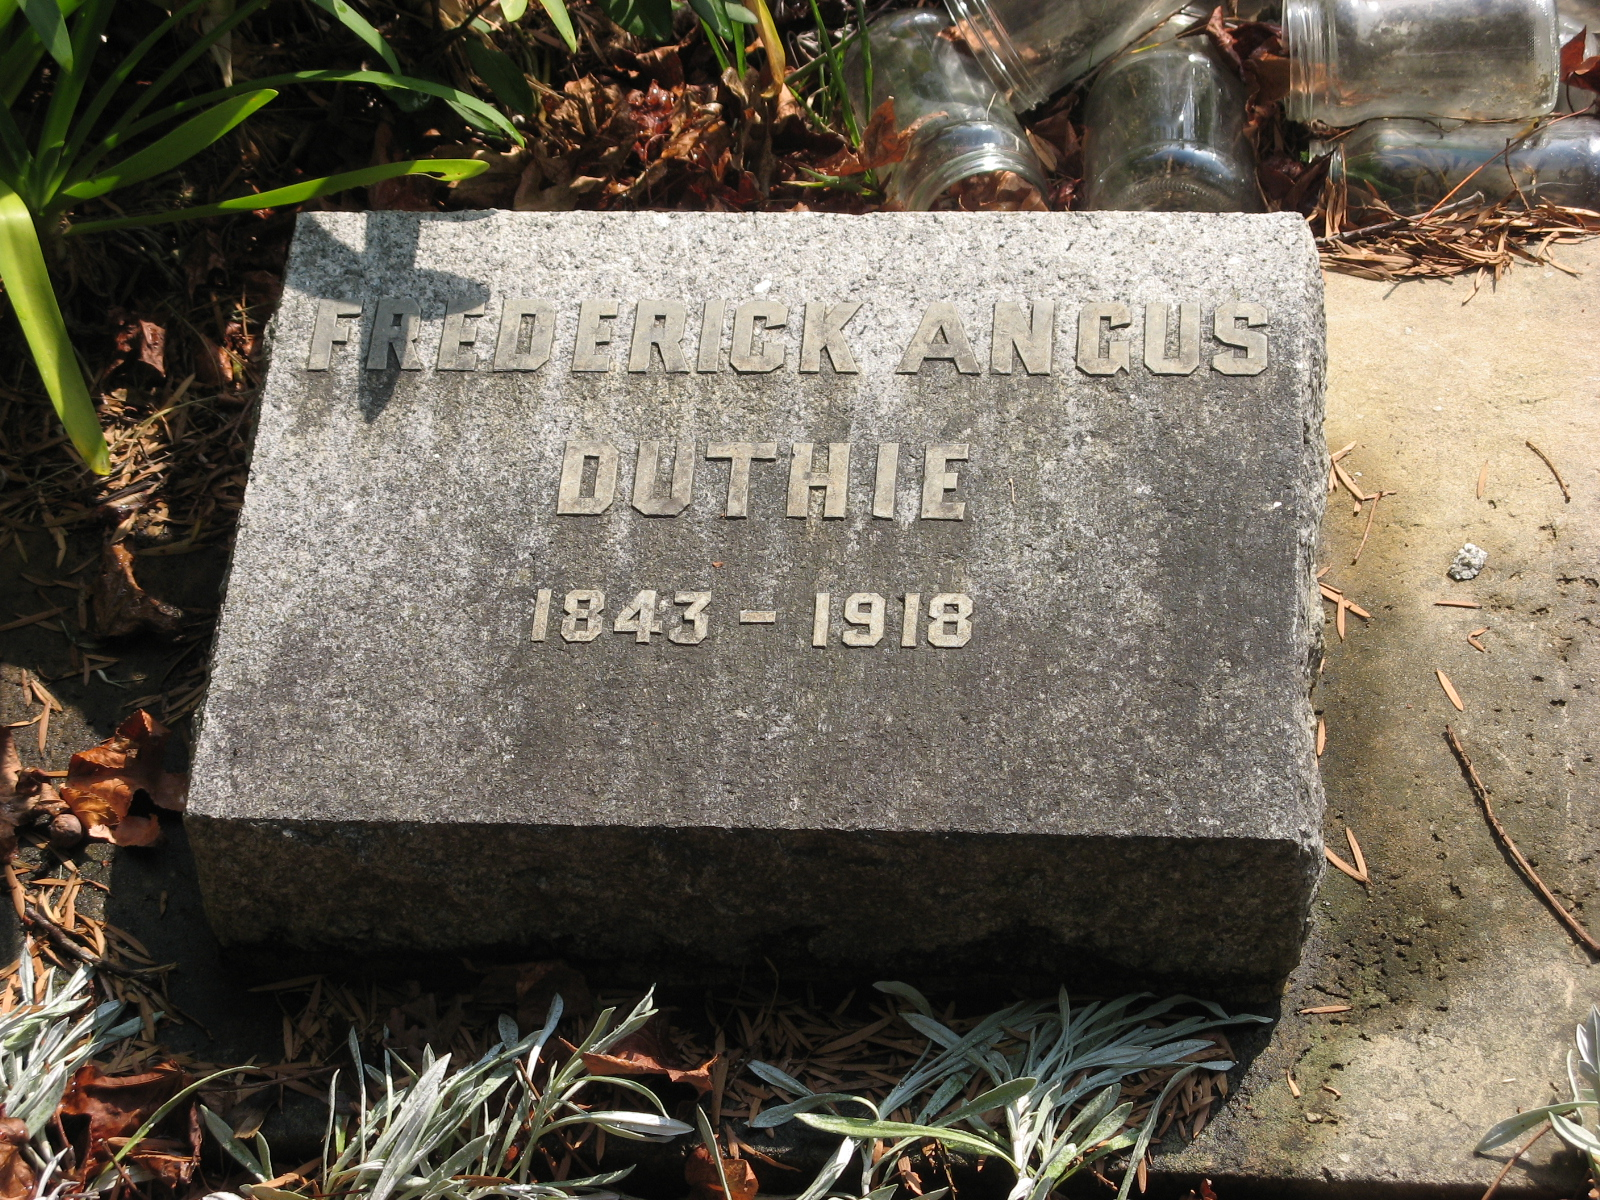 Duthie, Frederick Angus